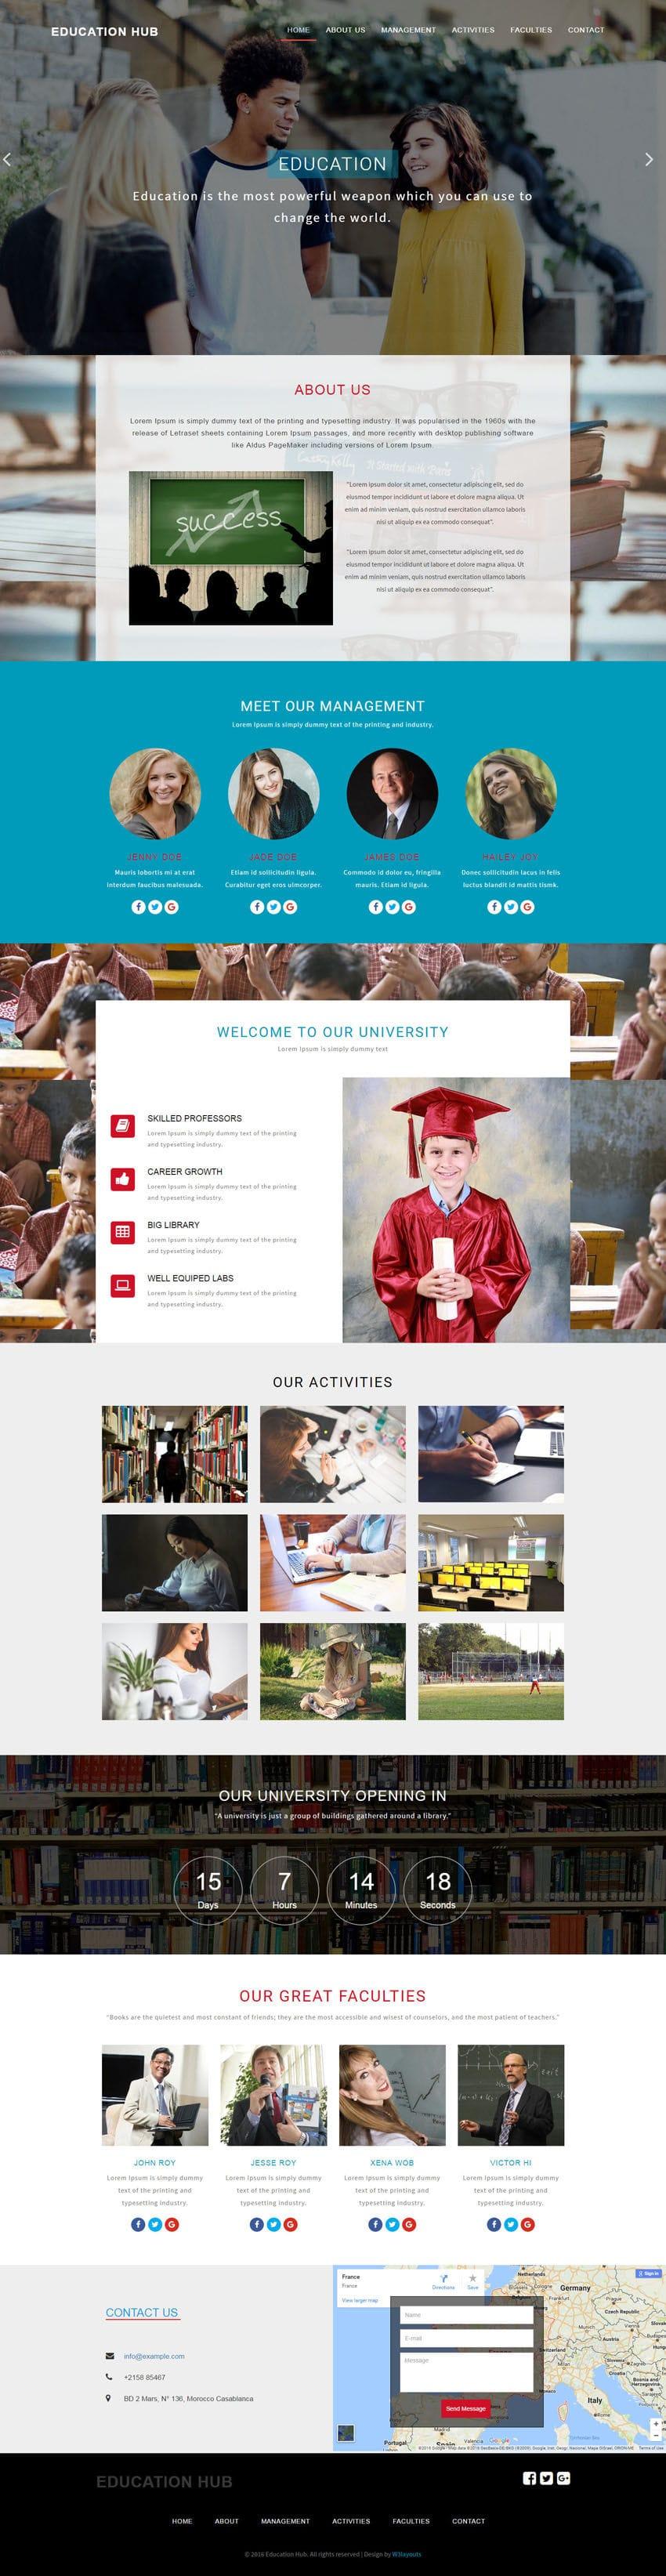 education_hub_full